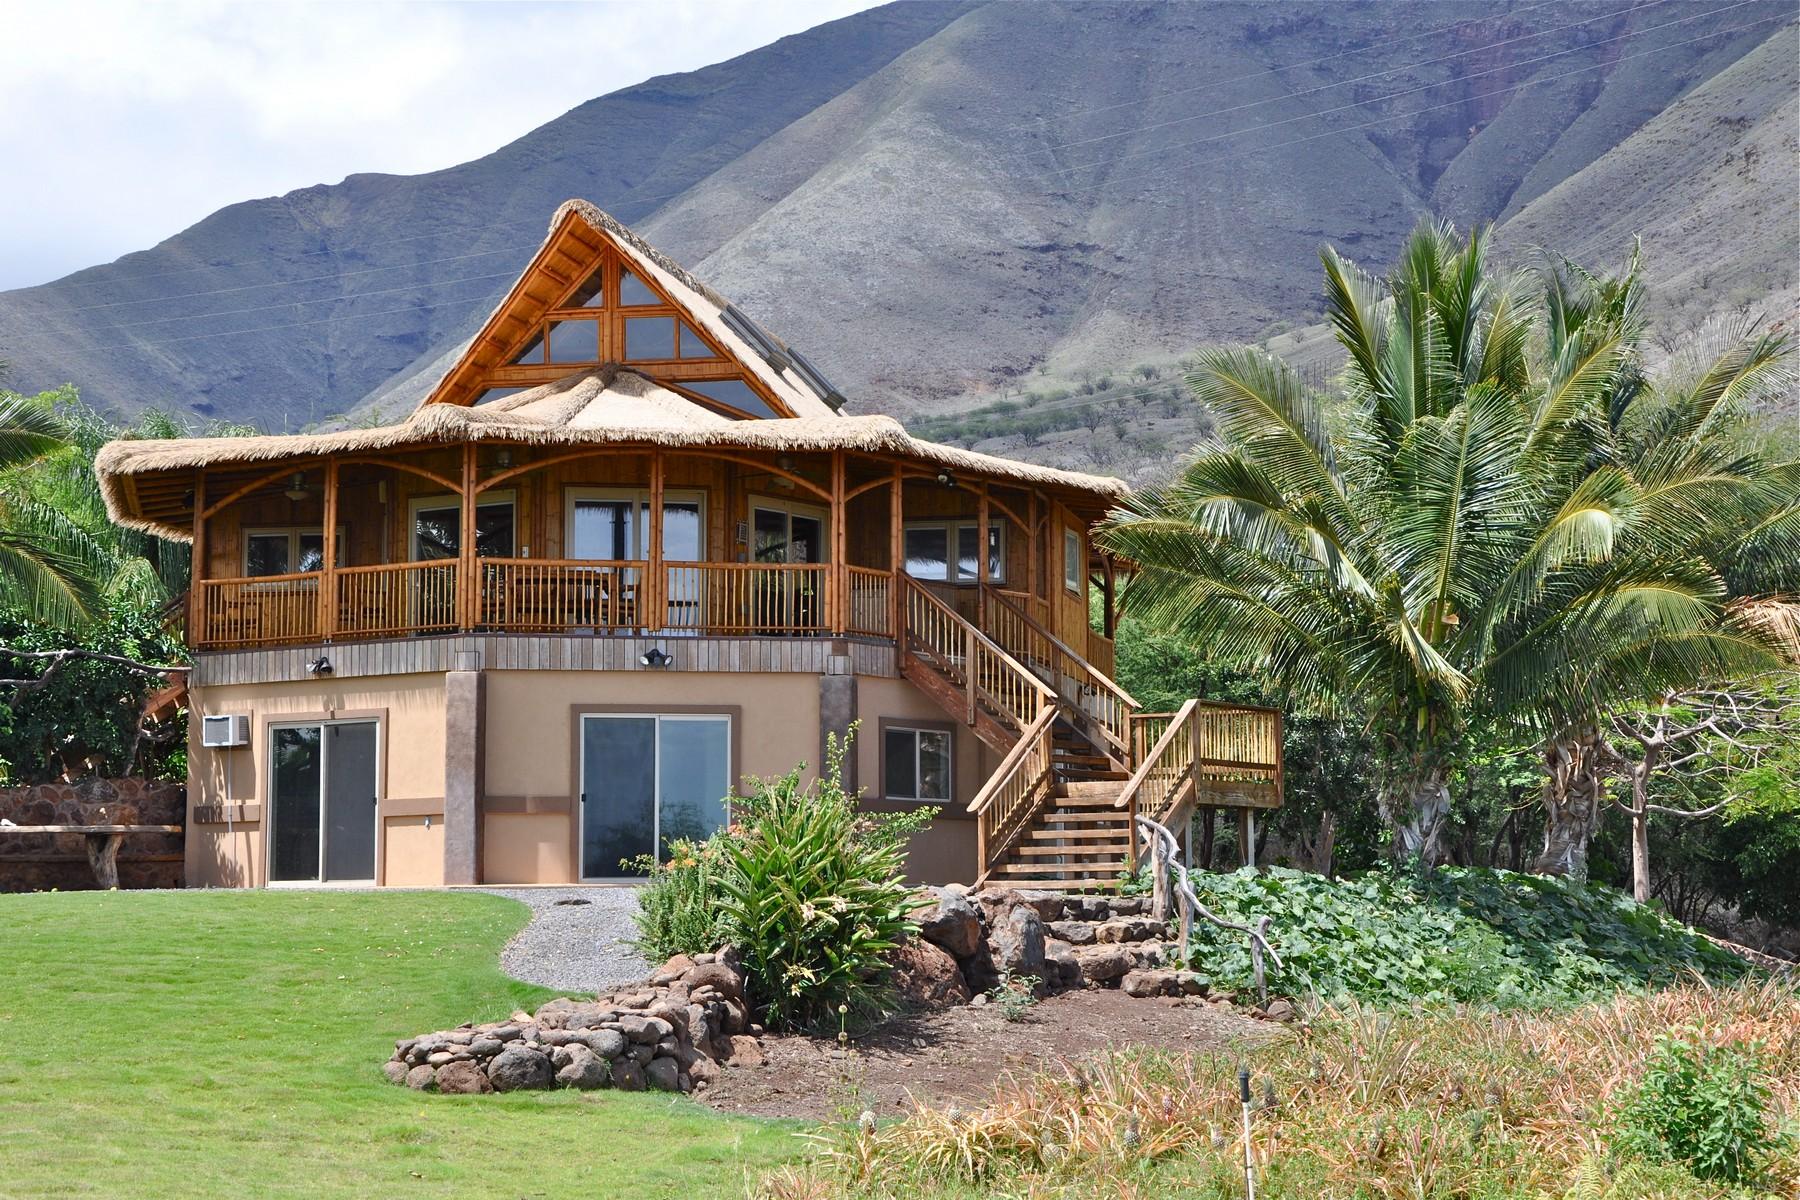 Single Family Homes for Sale at Island Style Living 849 Paekii Pl Lahaina, Hawaii 96761 United States